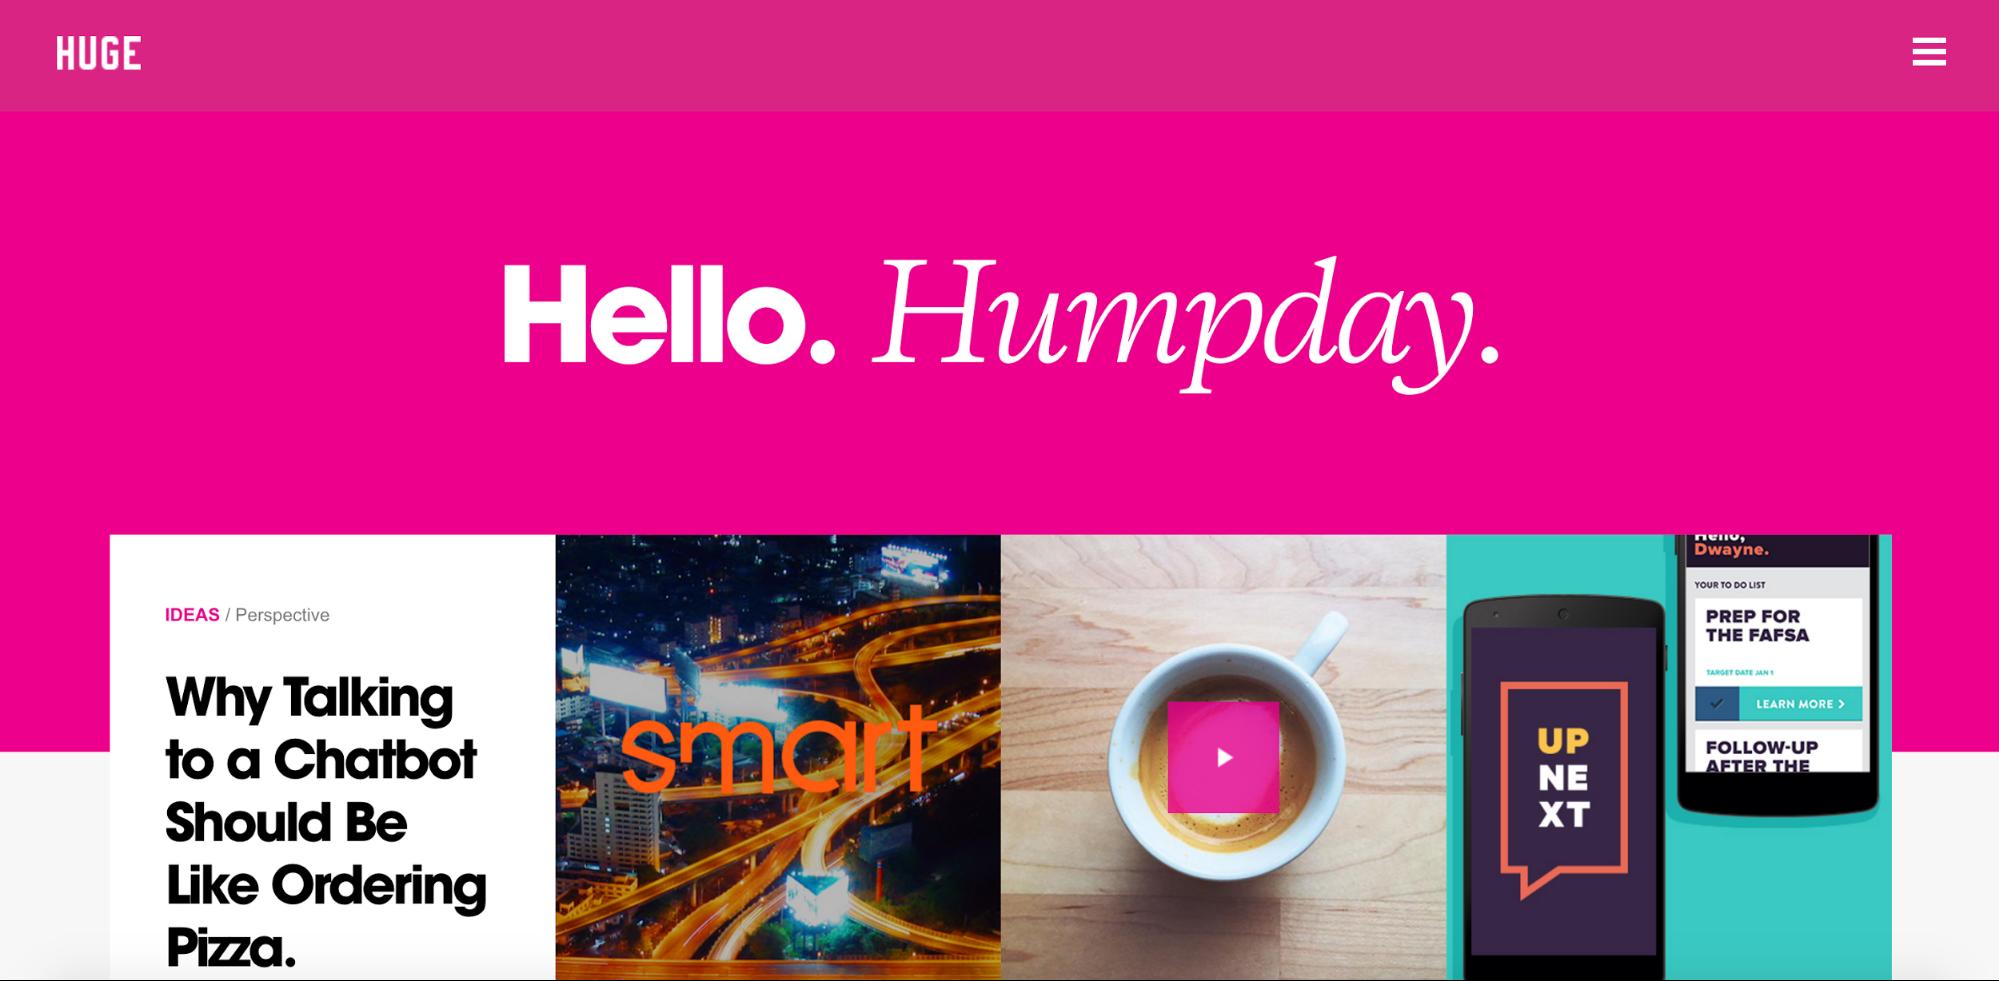 Huge Inc's website using bright pink